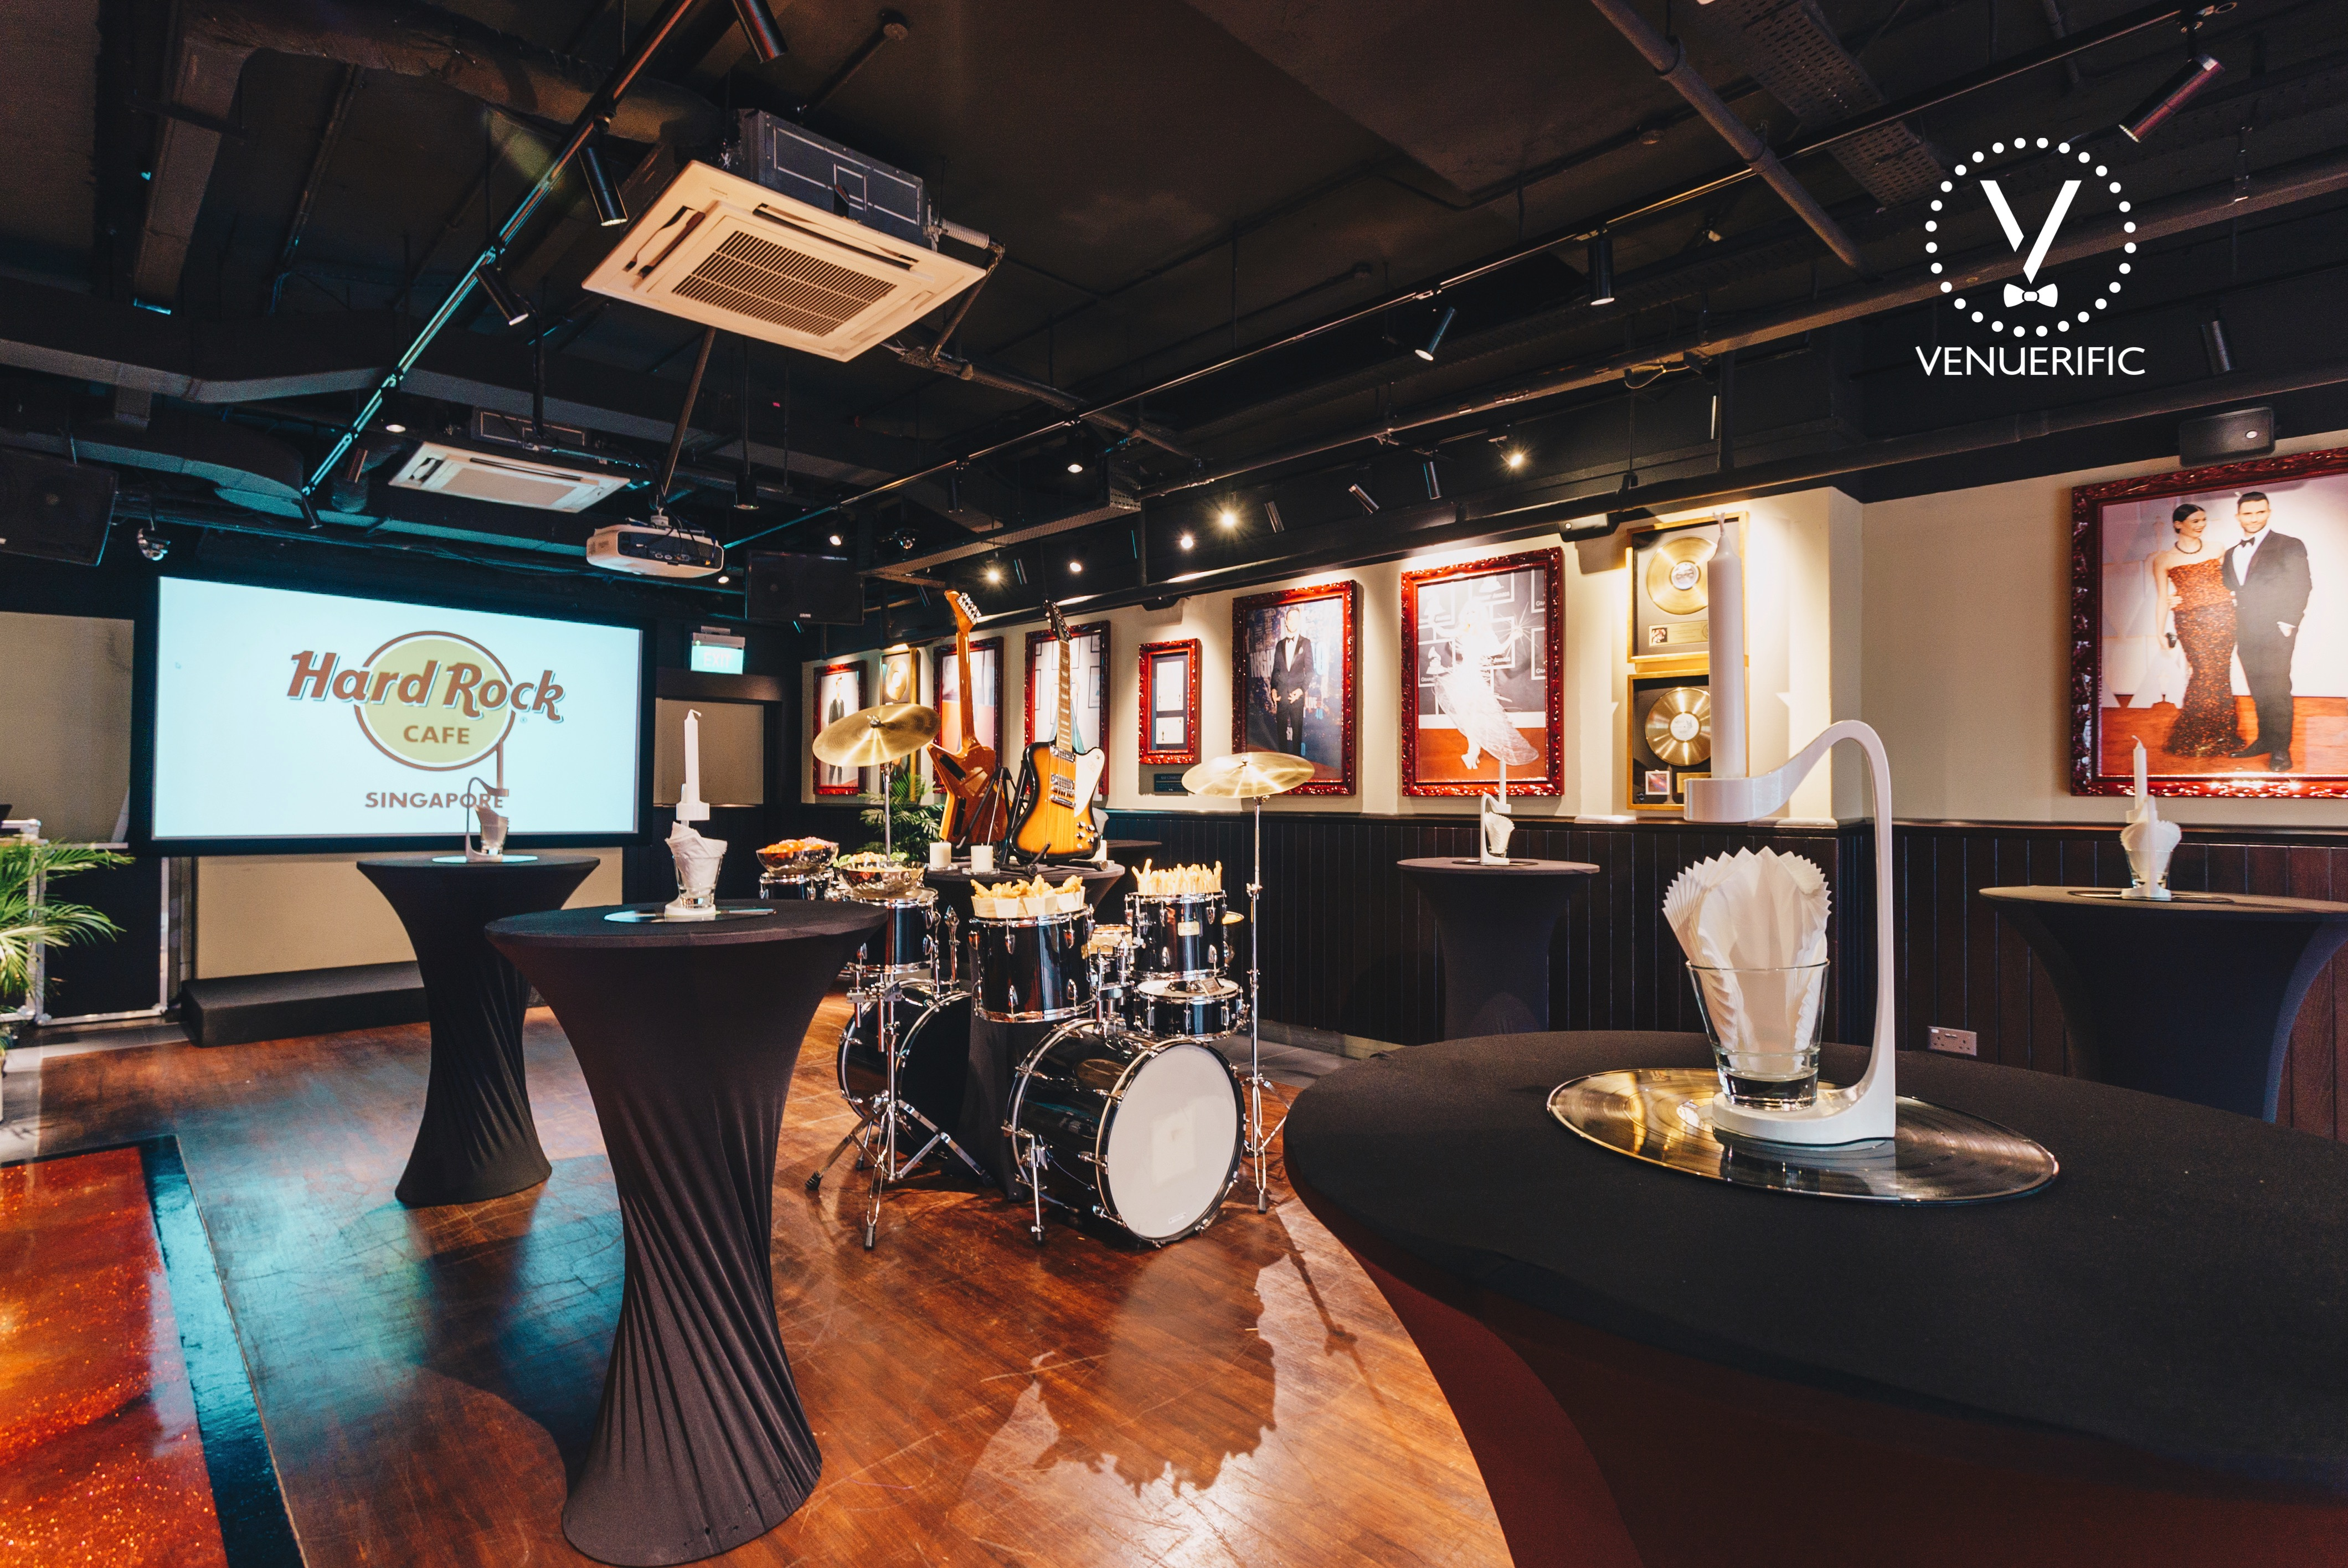 Hard-Rock-Cafe-Singapore-unique-wedding-space